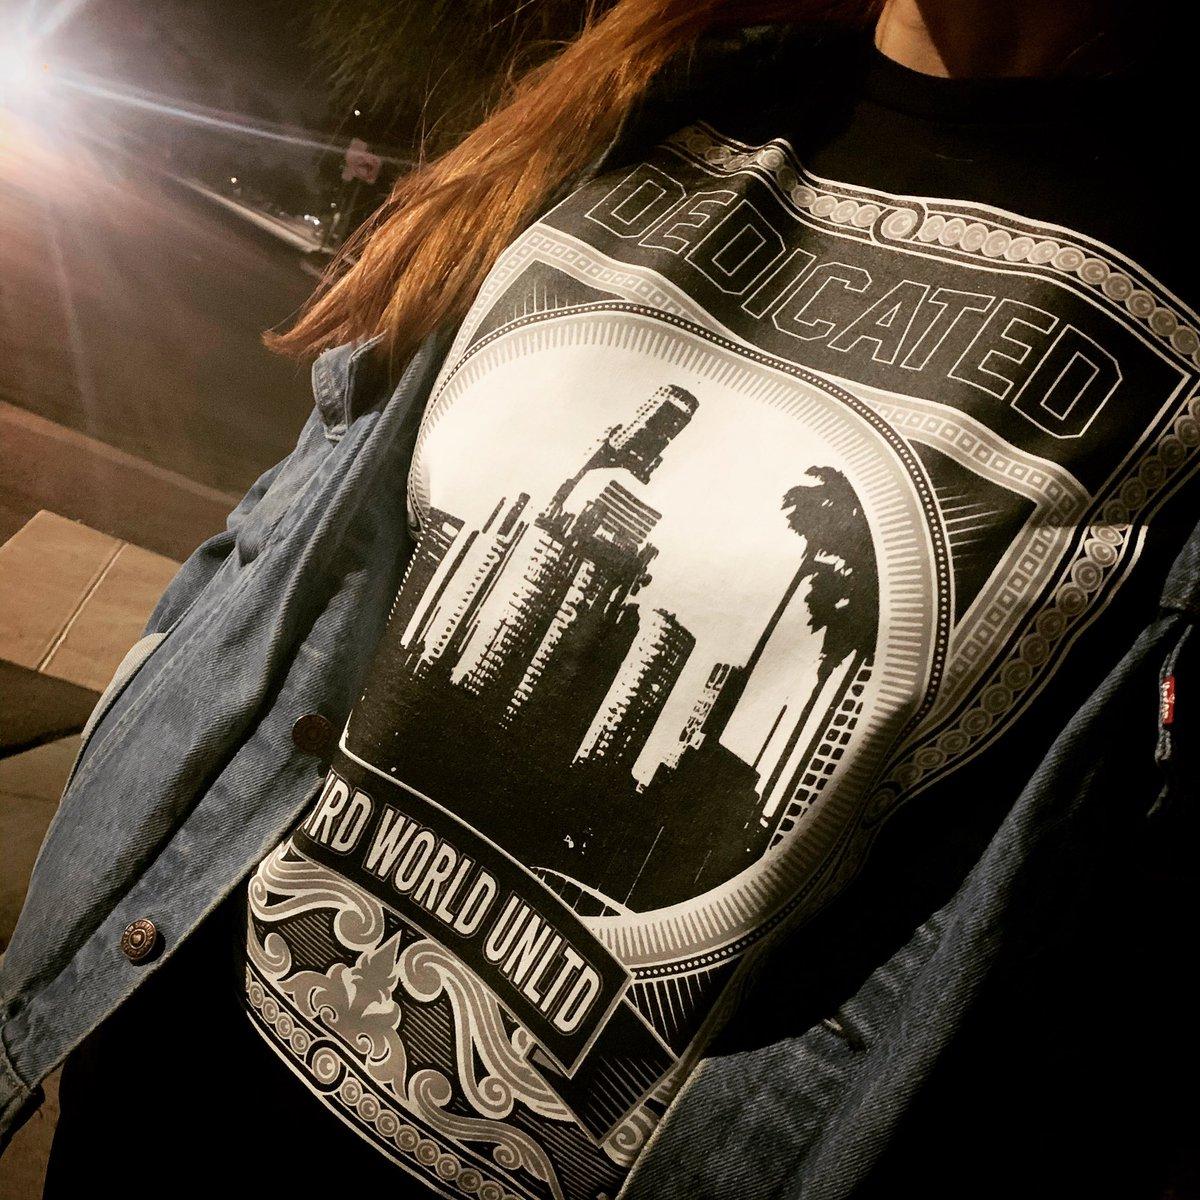 "25% Off Starts Now.  ""Dedicated"" drops this weekend.  Only at http://www.thirdworldunltd.com . . . #thirdworldunltd #dedicated #streetwearchick #streetwear #urbanapparel #dtla #dtlalife #downtownla #losangeles #westcoast #southerncalifornia #buyonegiveonepic.twitter.com/MuLNlJvOB5"